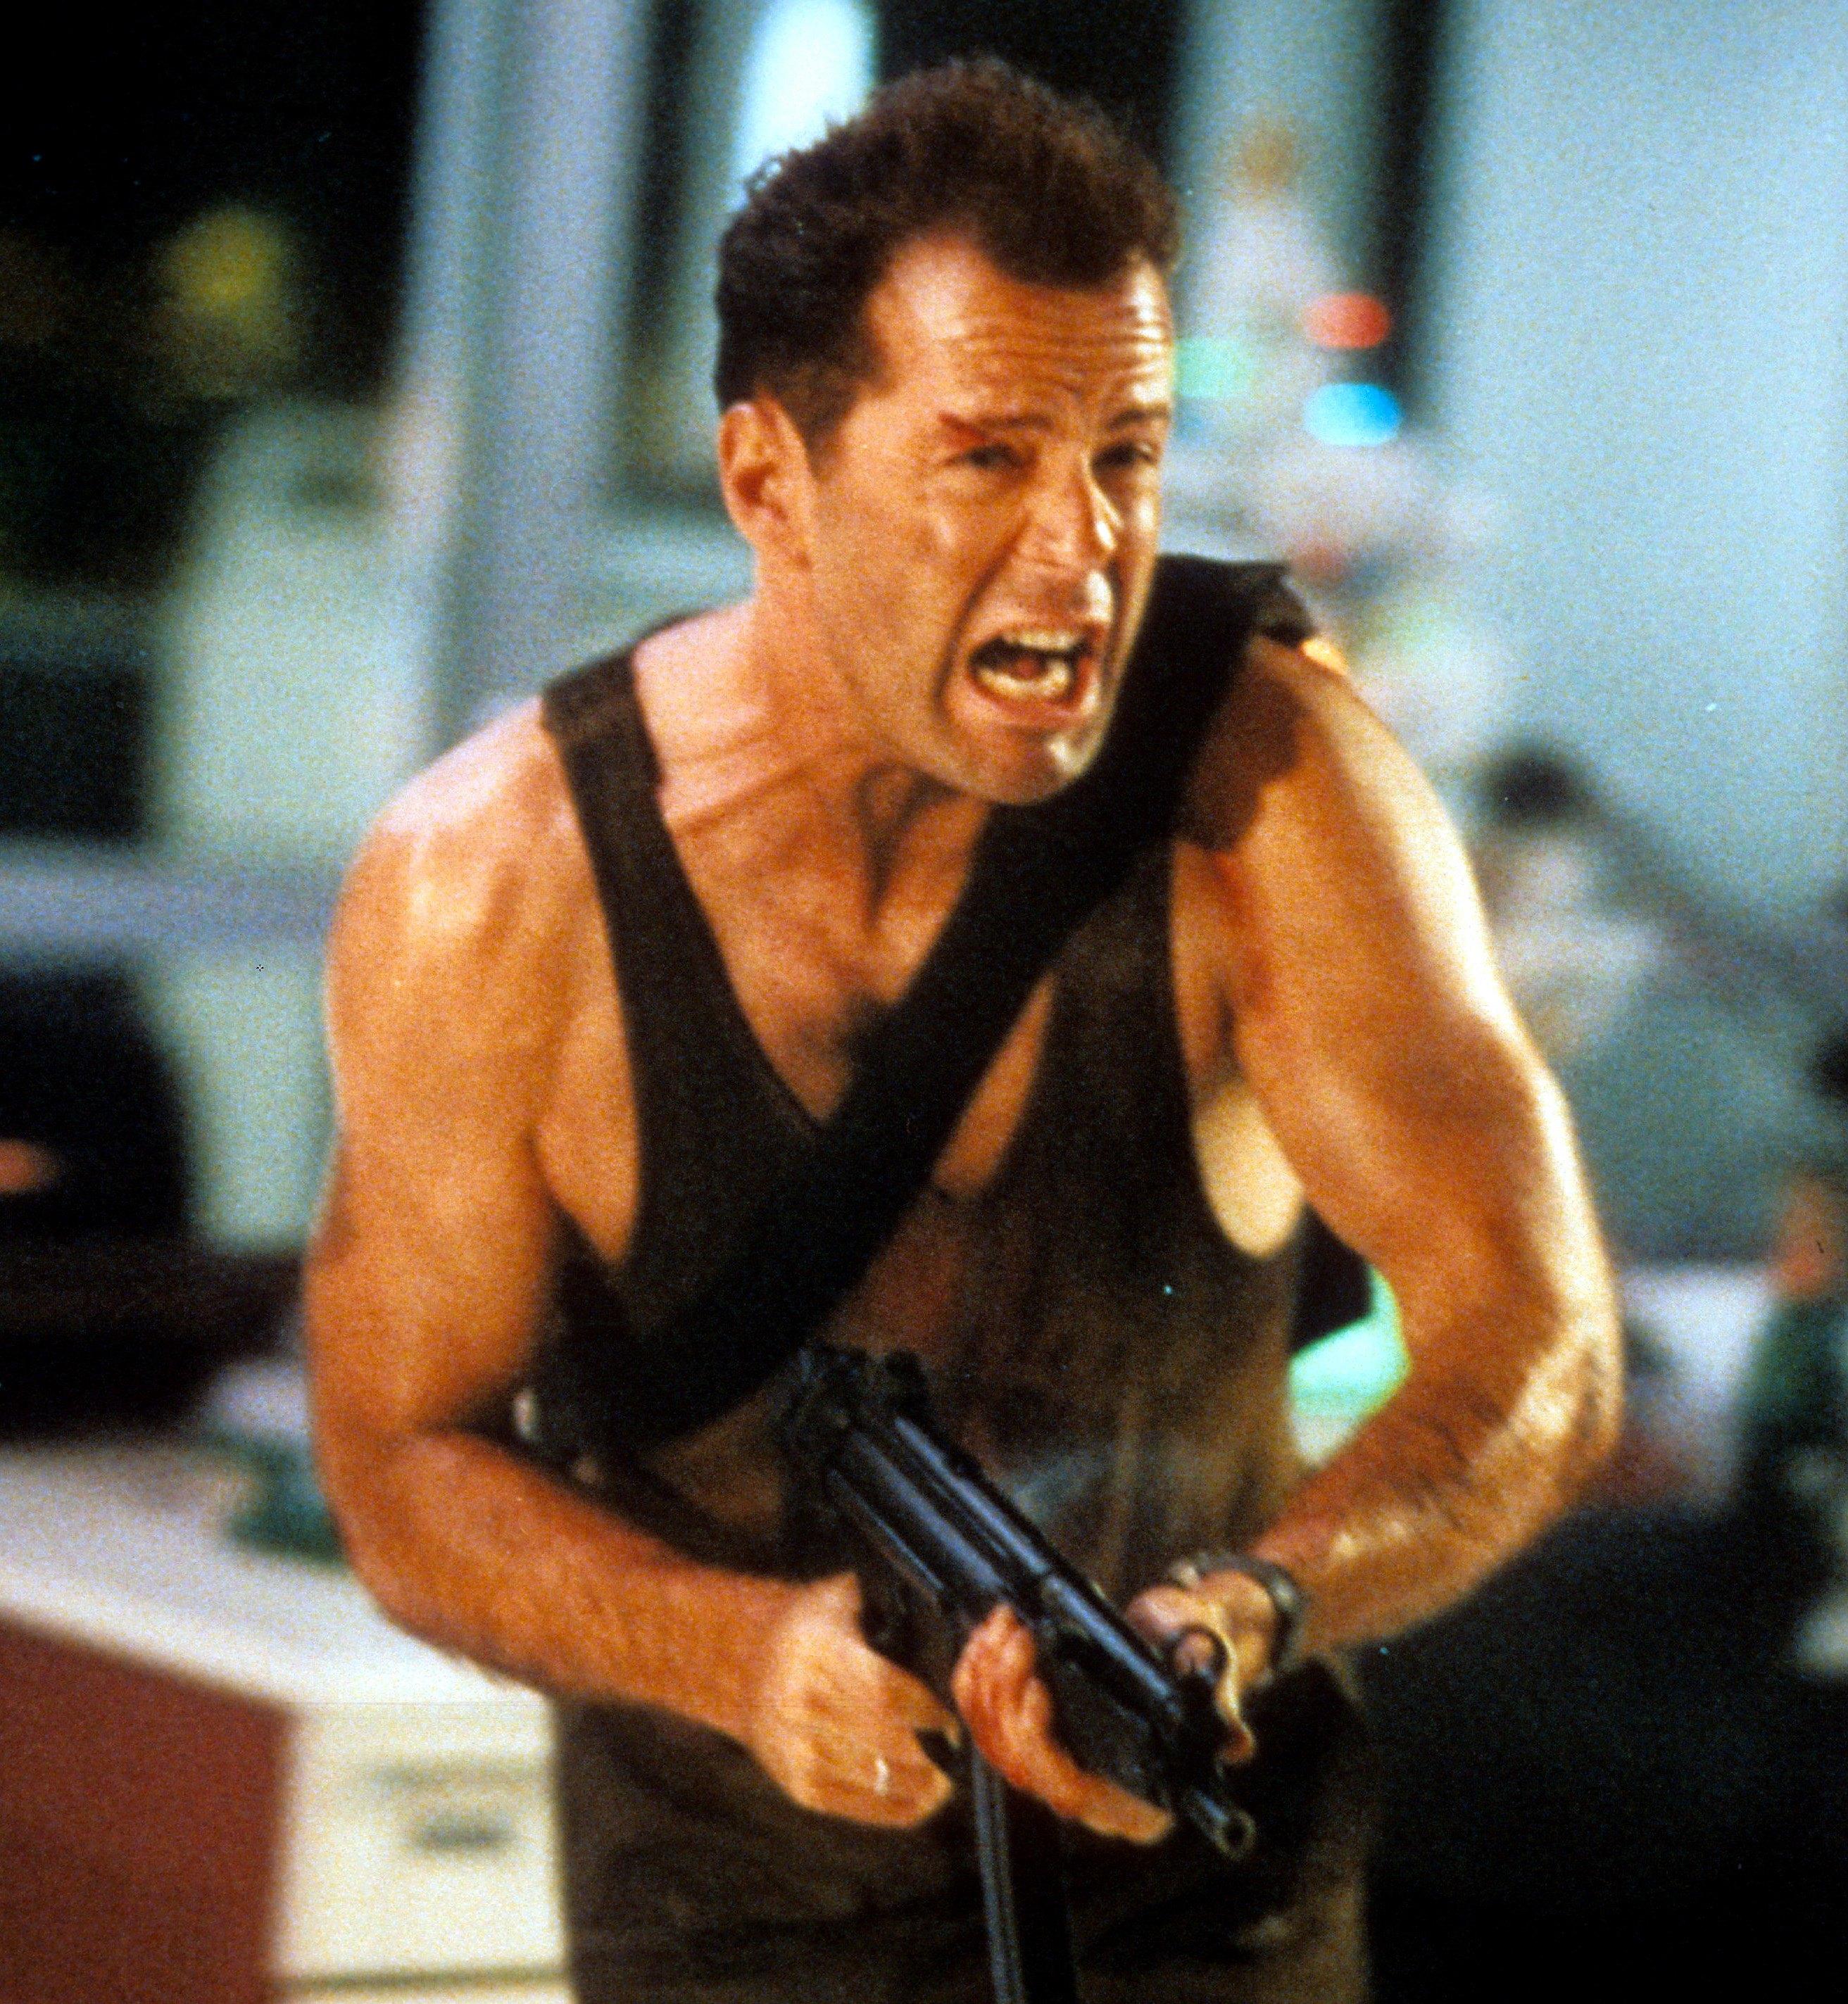 Bruce Willis wielding a machine gun as John McClane in Die Hard 1988